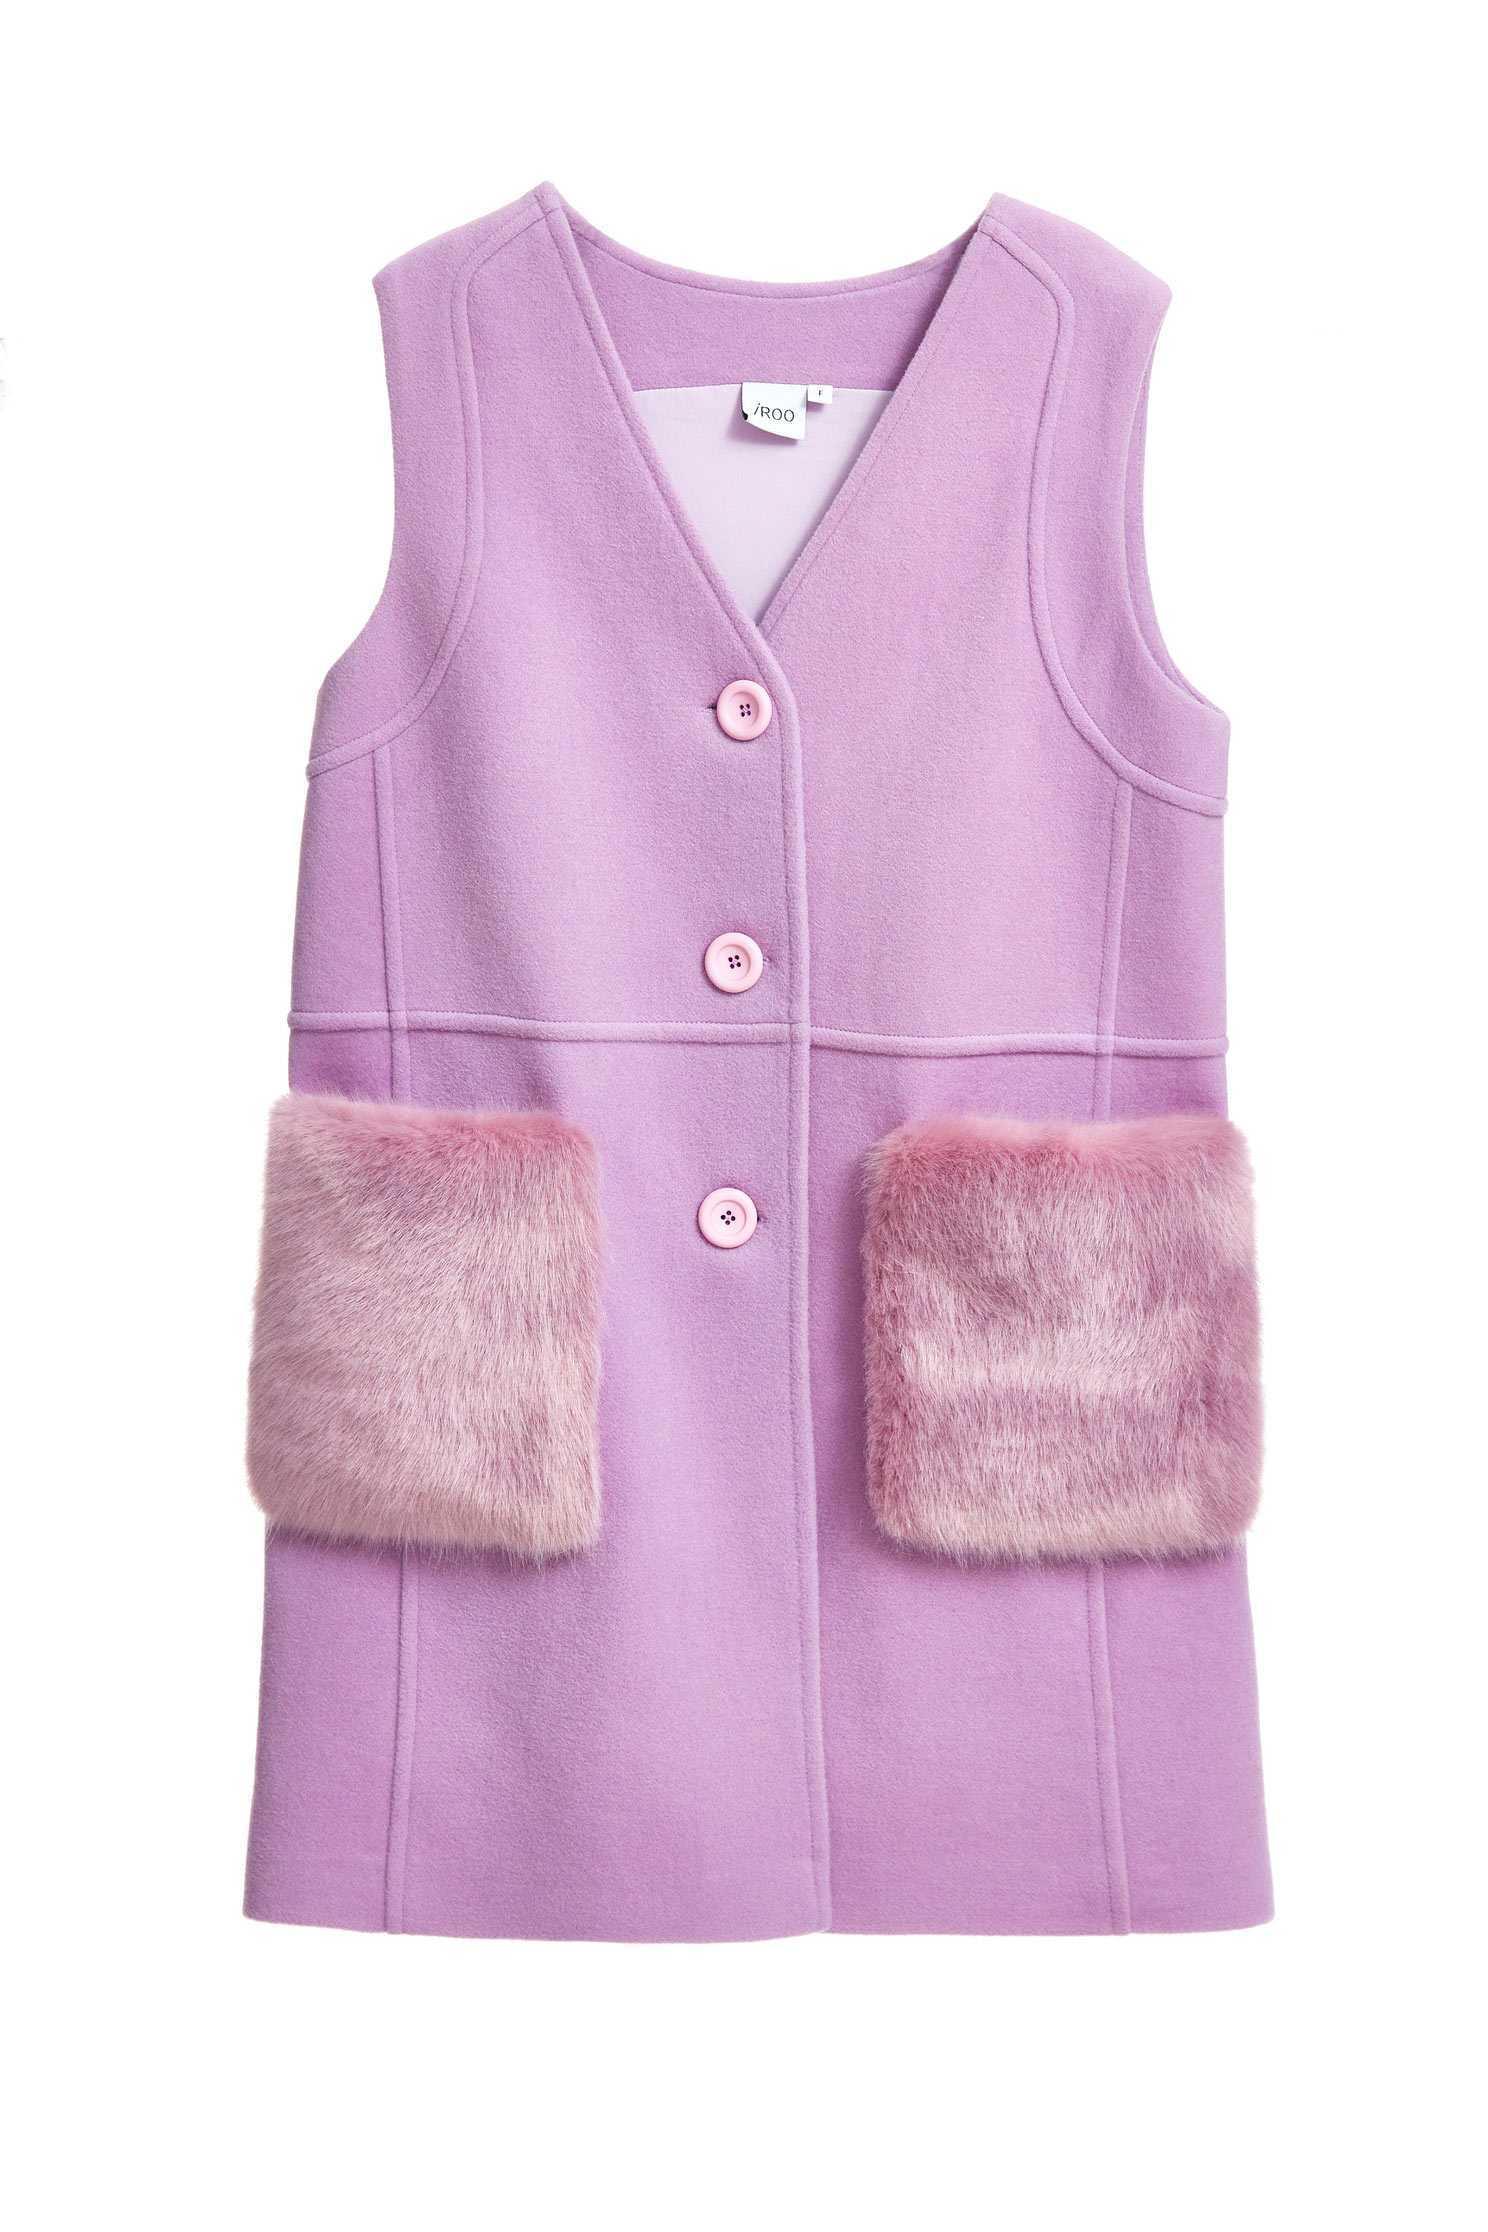 Fluffy pocket vest